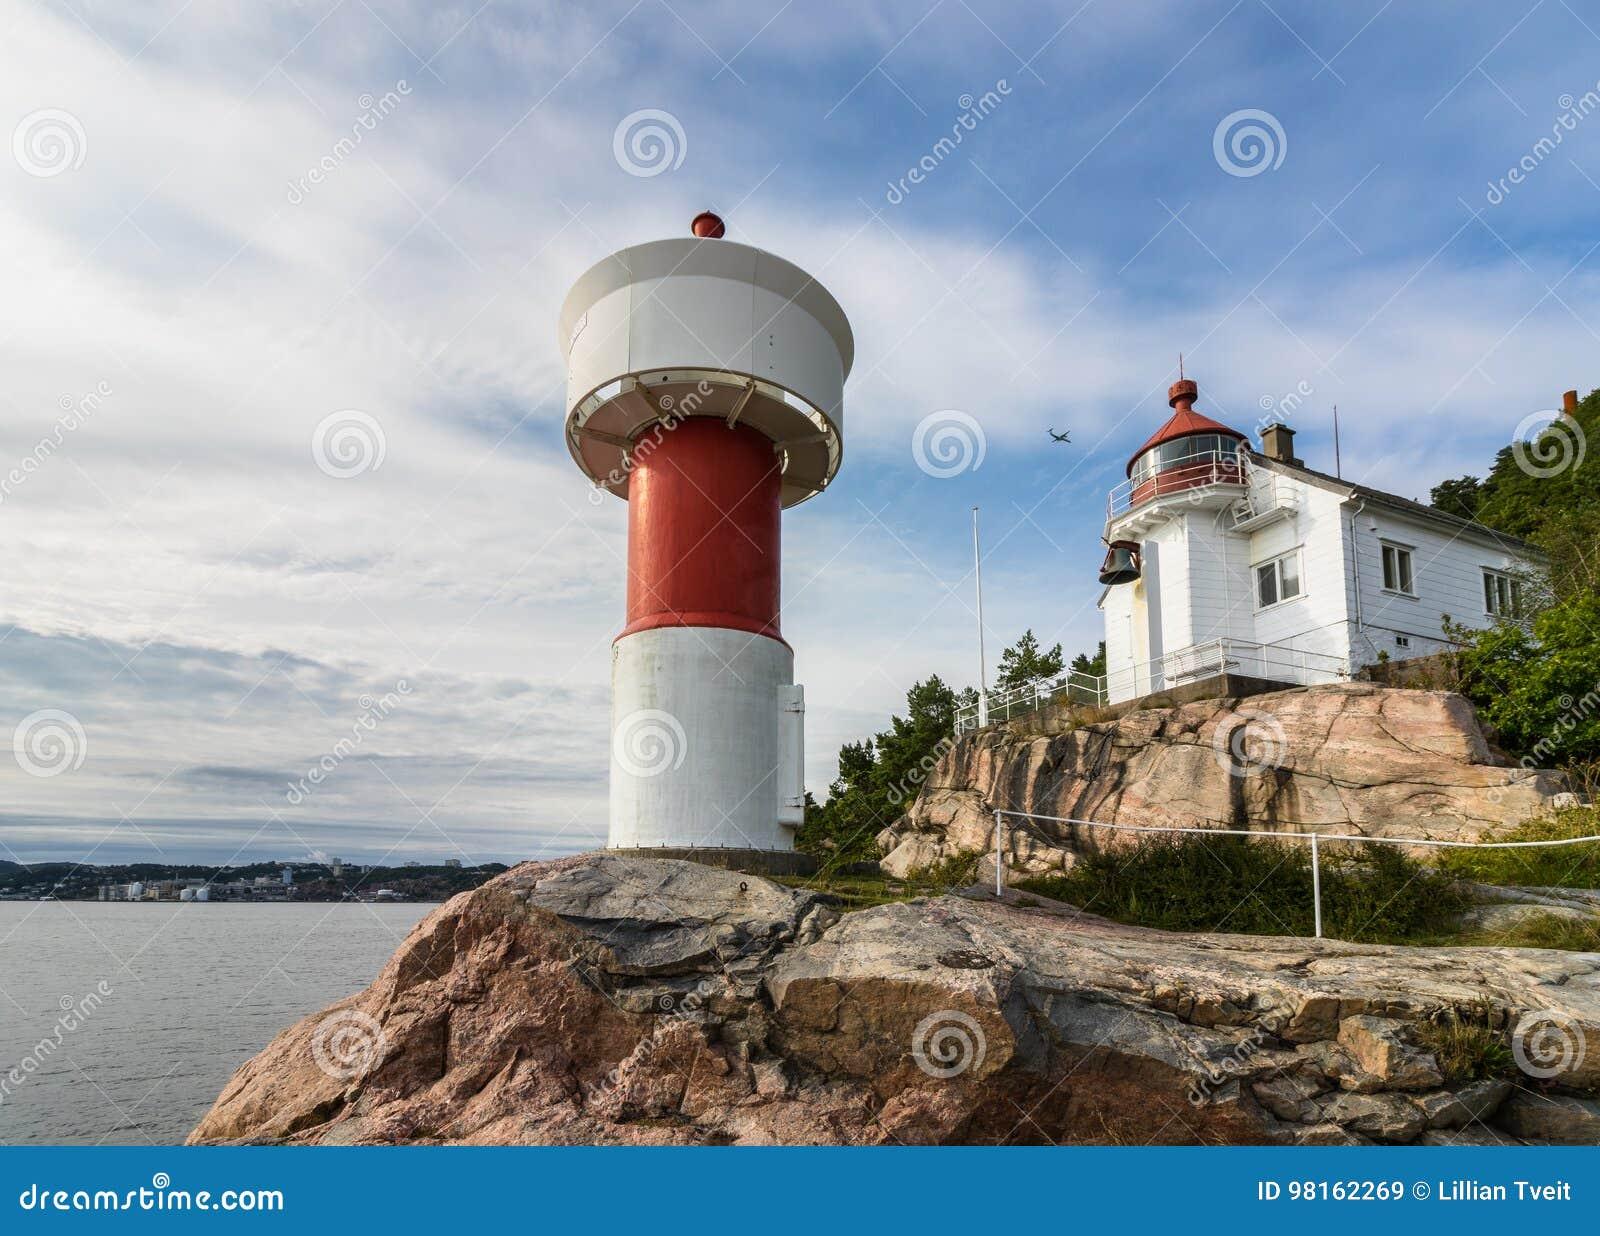 Latarnia morska przy Odderoya w Kristiansand, Norwegia